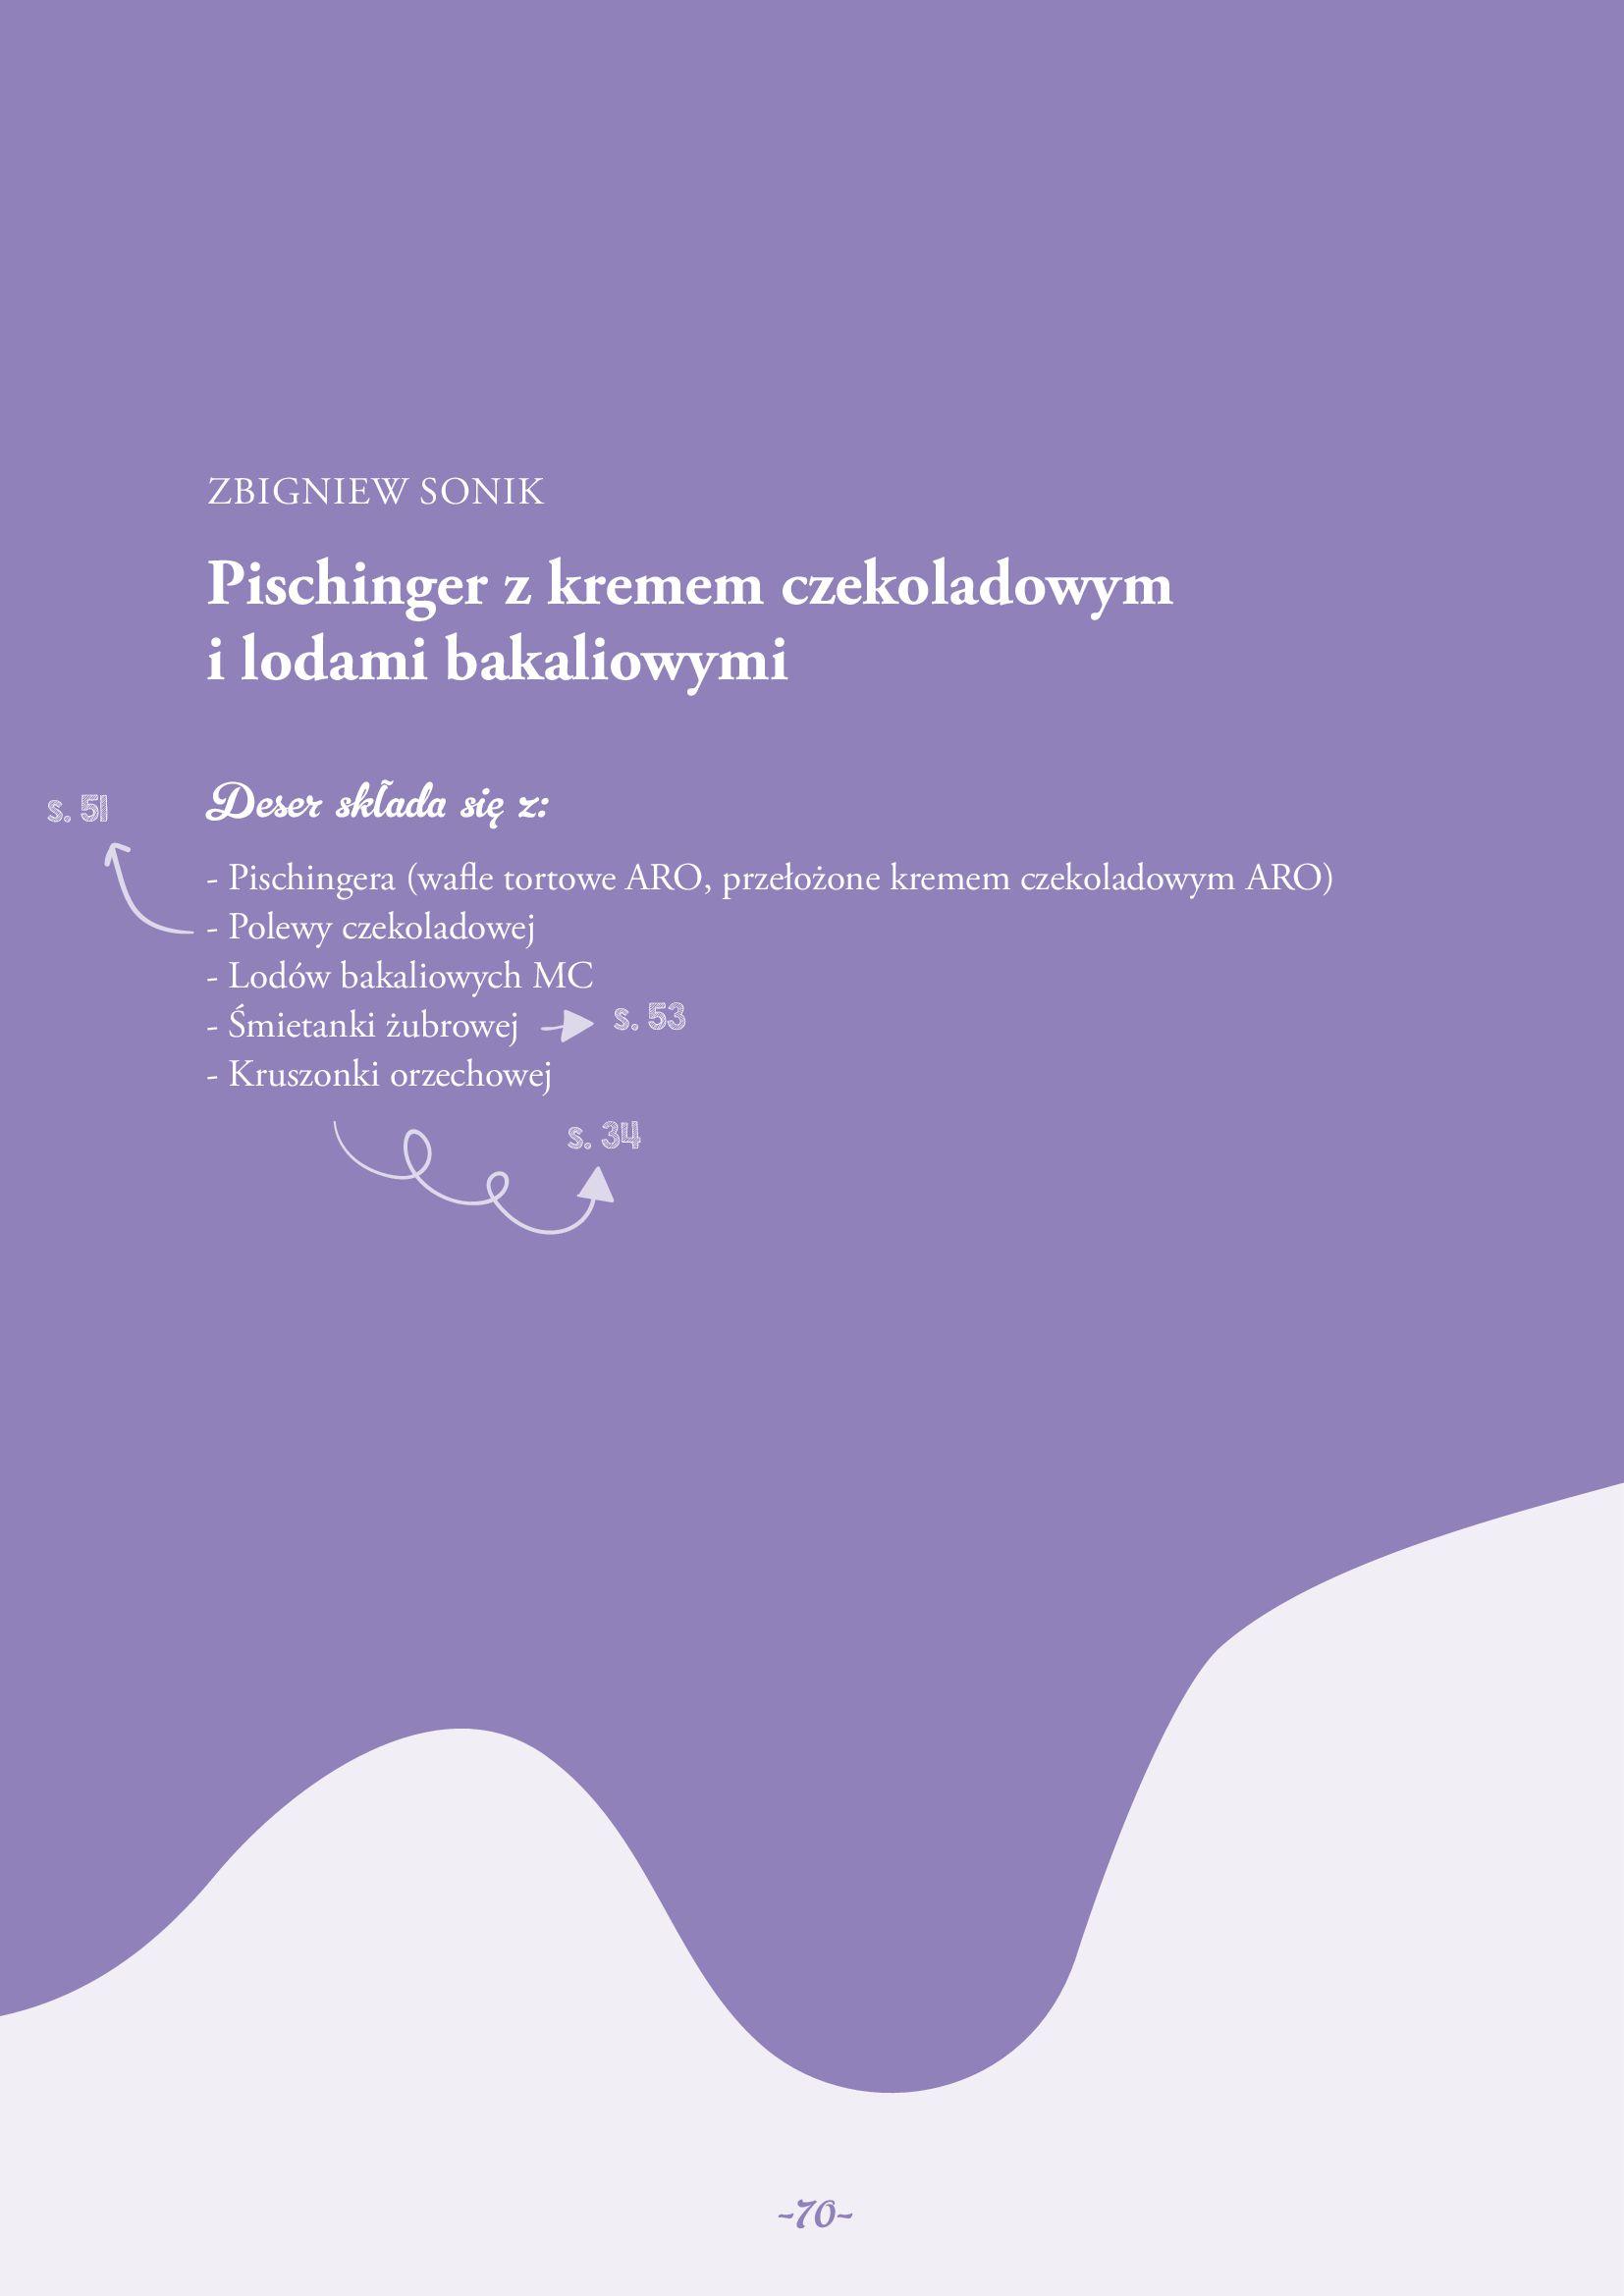 Gazetka Makro: Gazetka Makro - lody i desery 2021-05-21 page-70